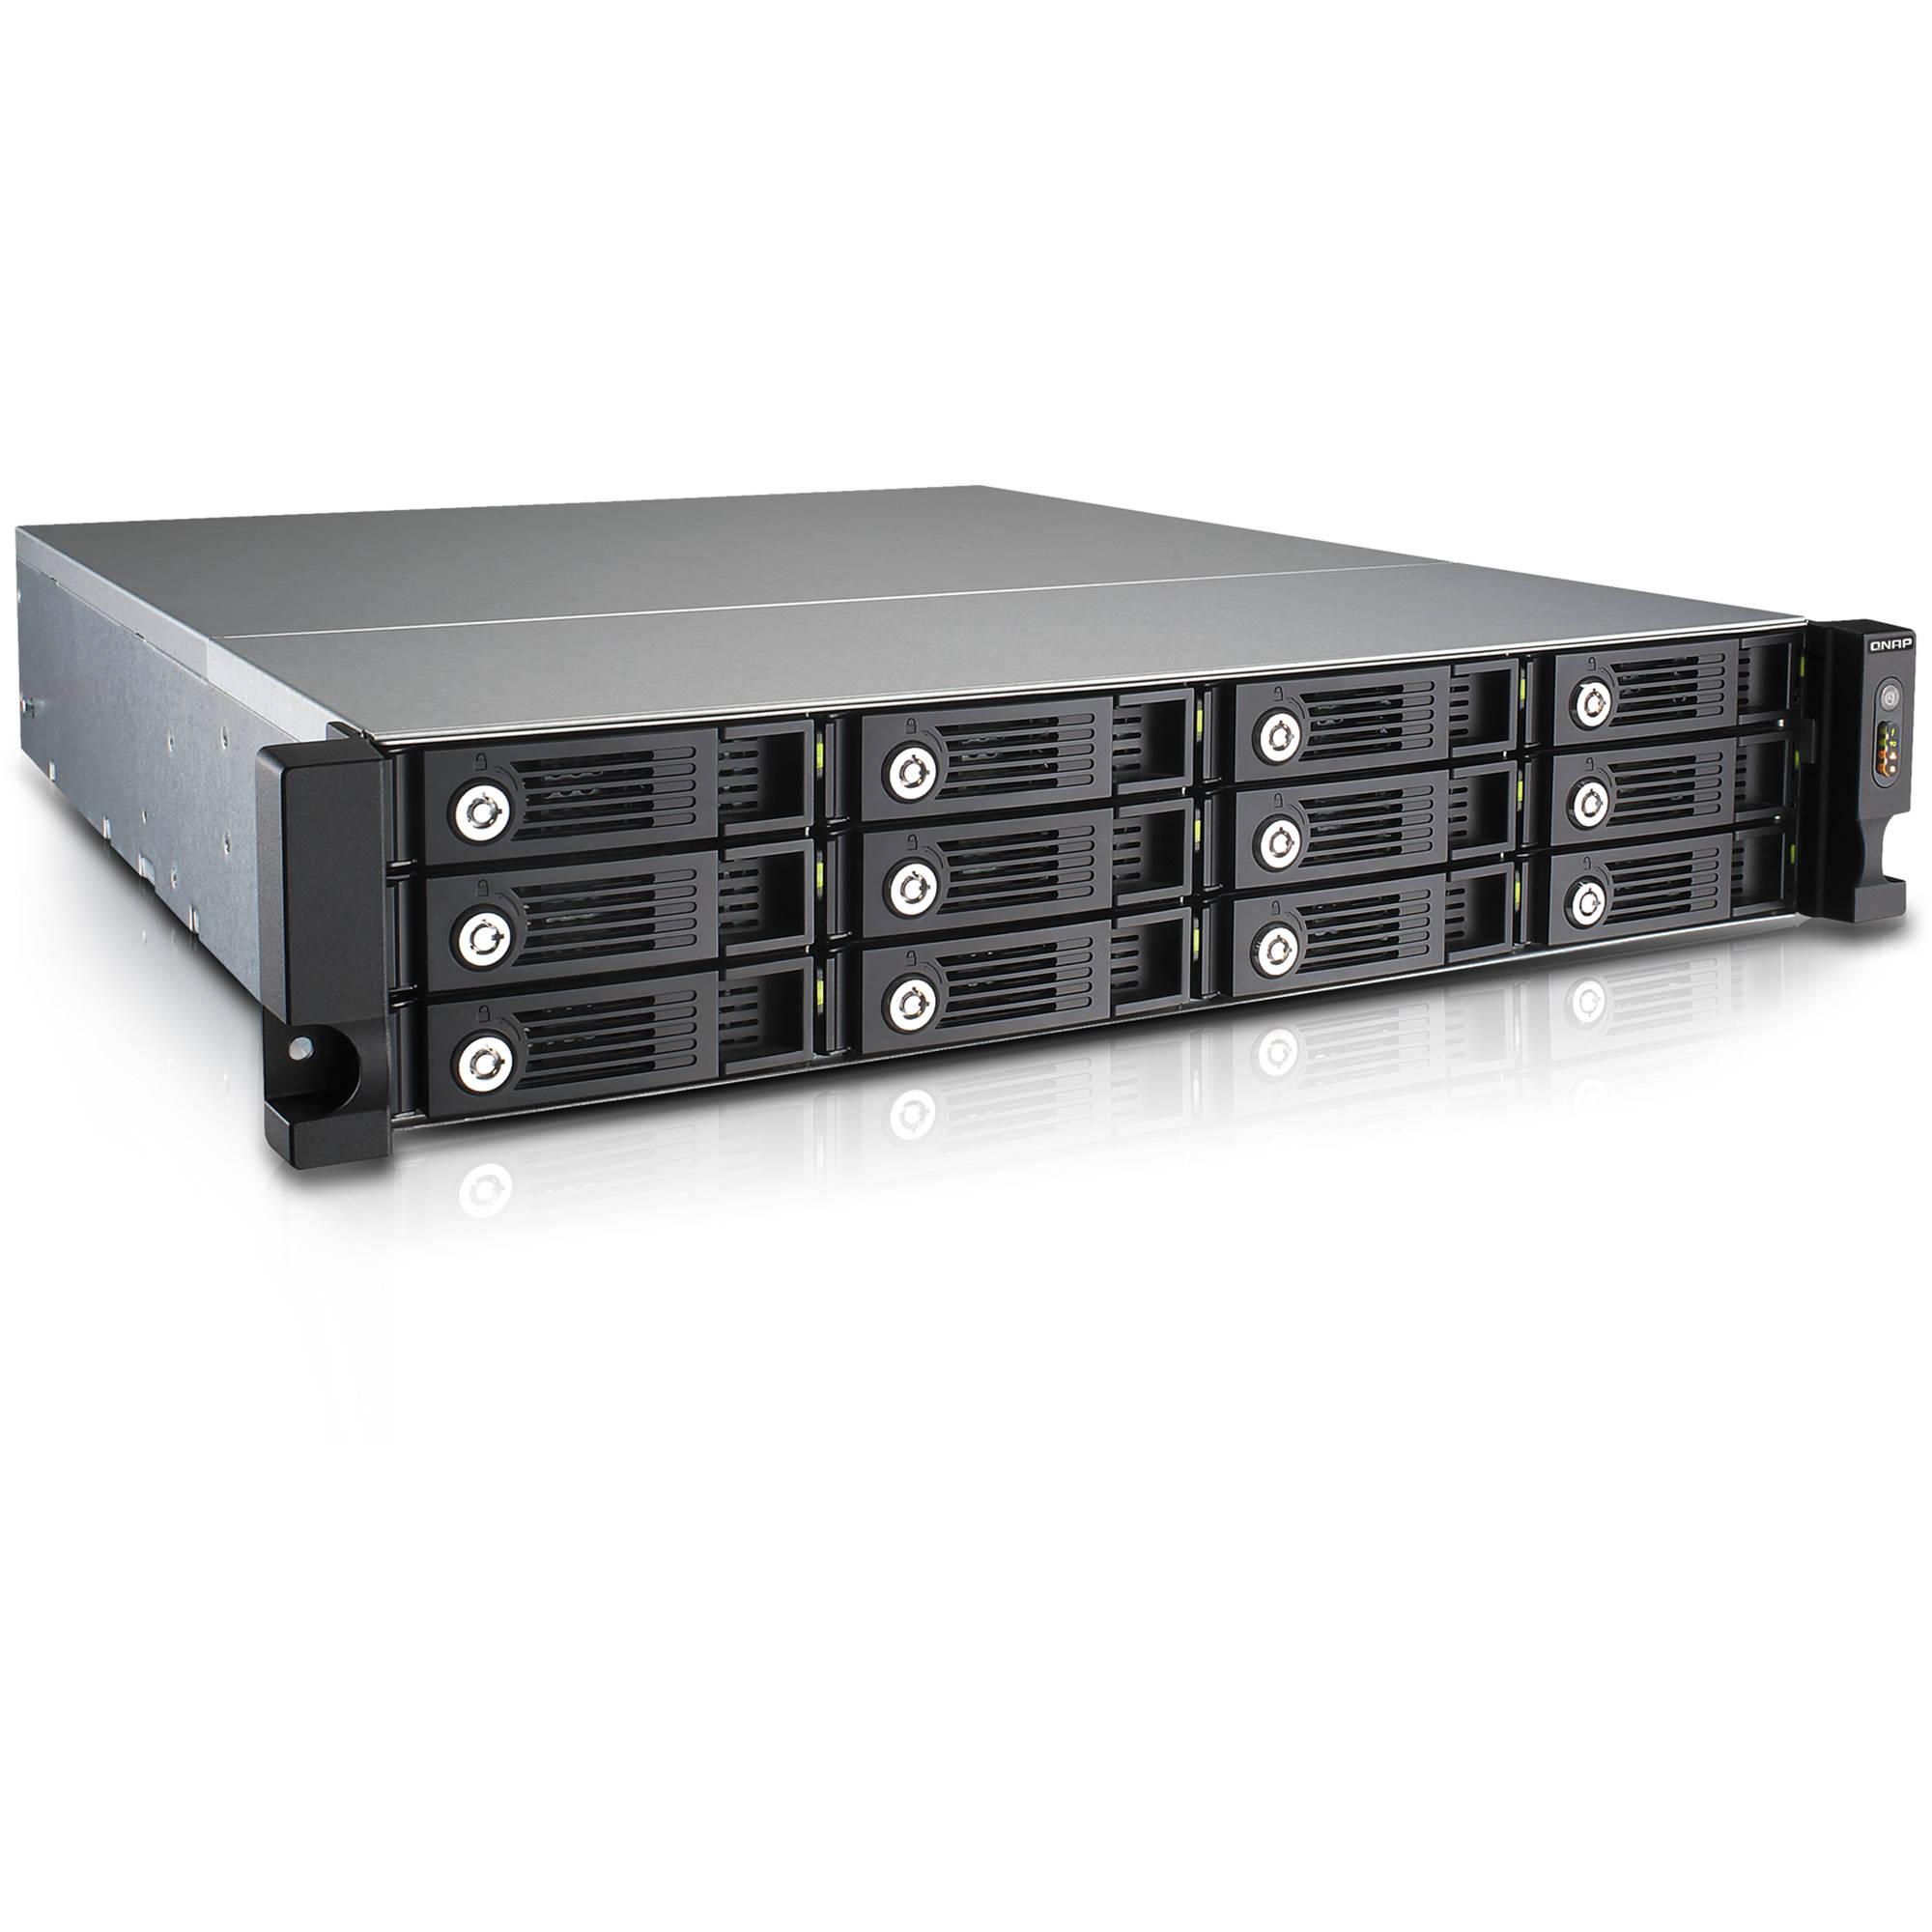 QNAP TS-1270U Turbo NAS Download Drivers